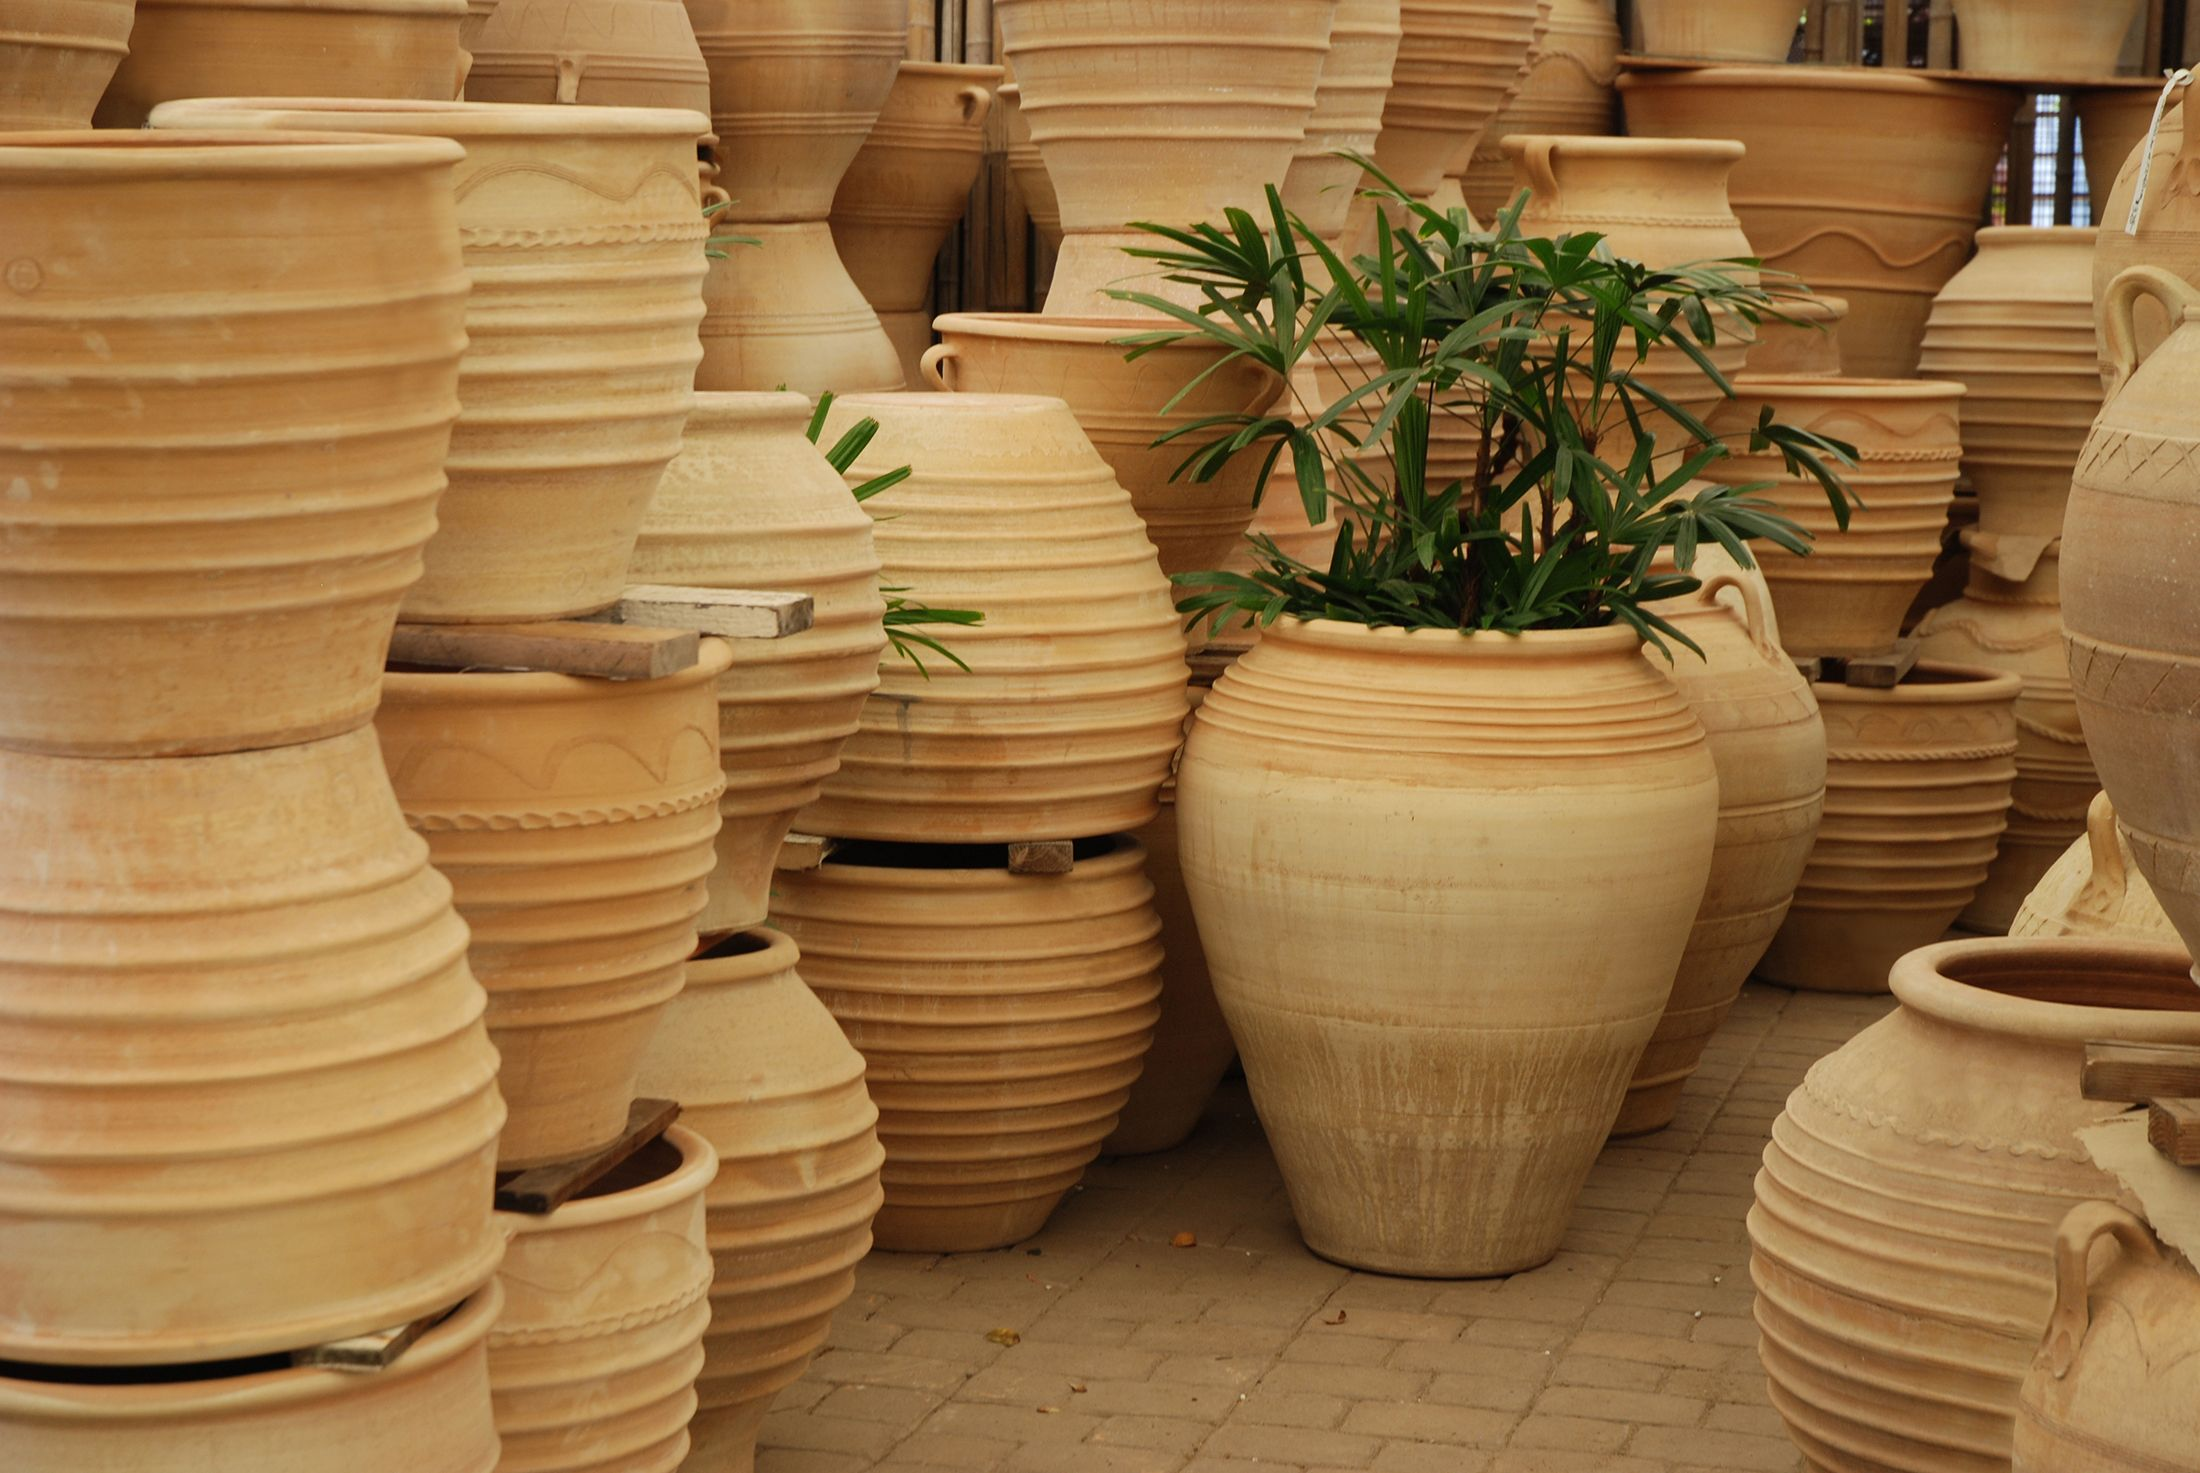 Italian Terracotta & Anduze Pots   Antique Italian & Garden Pottery ...